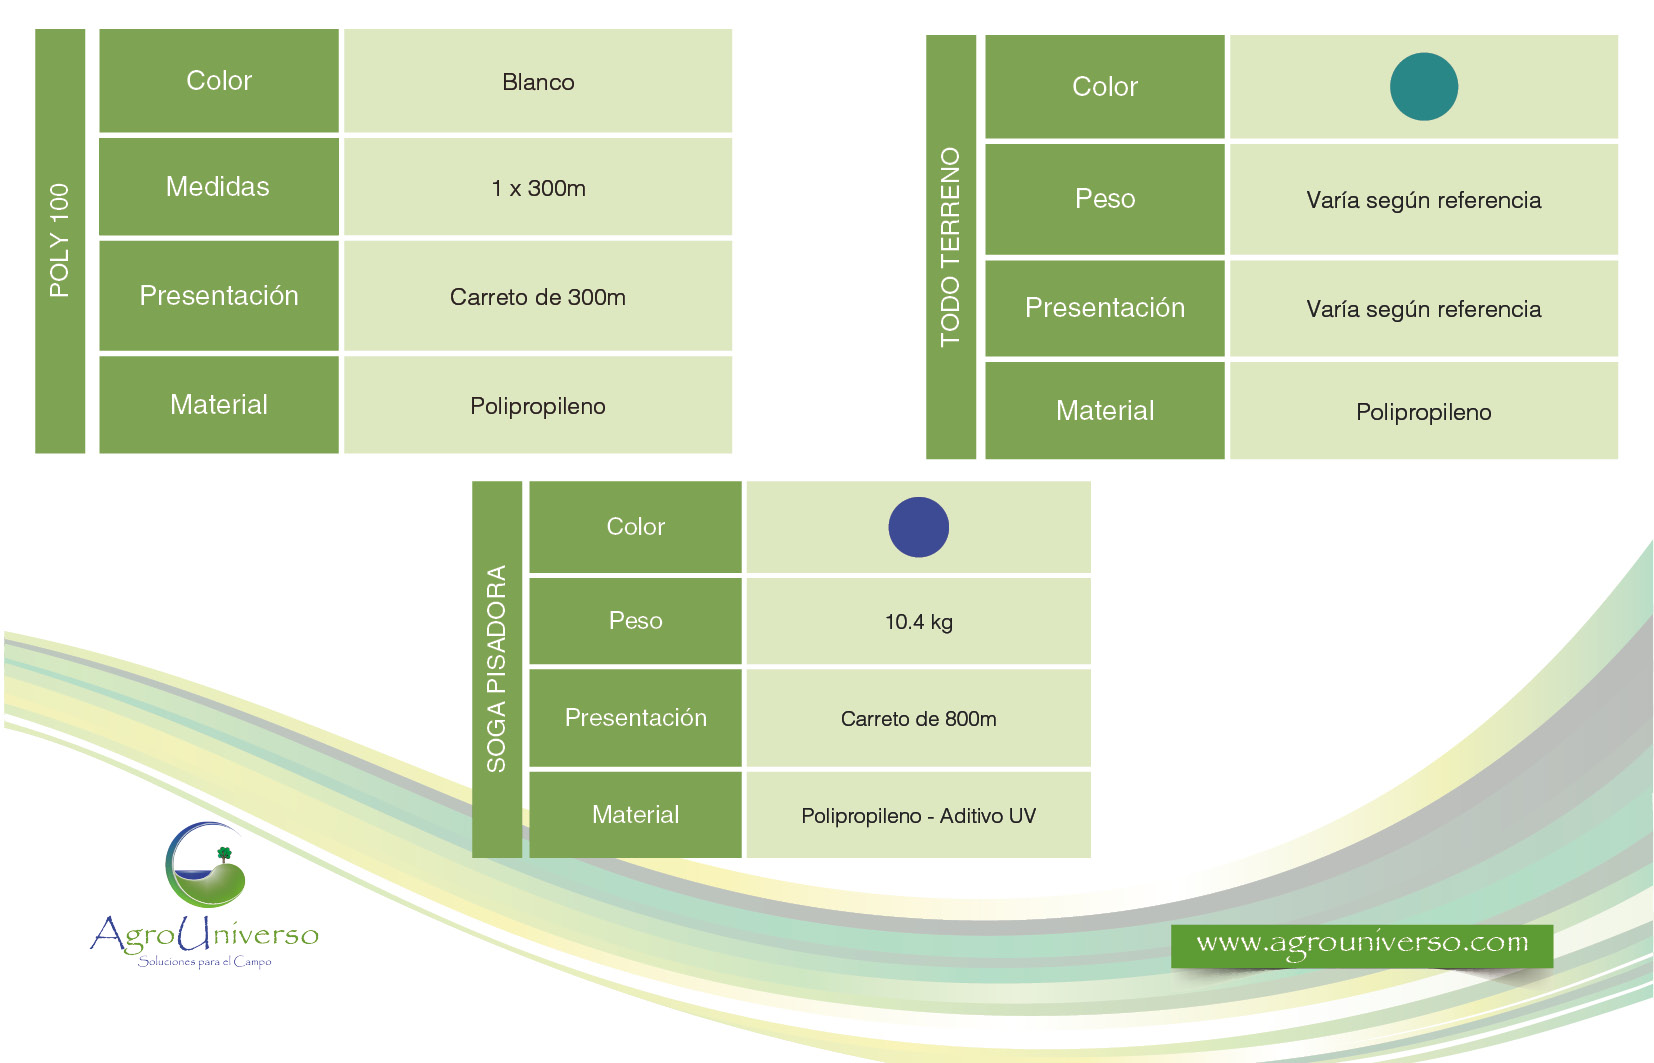 Catlogo-de-productos-Agrouniverso-21